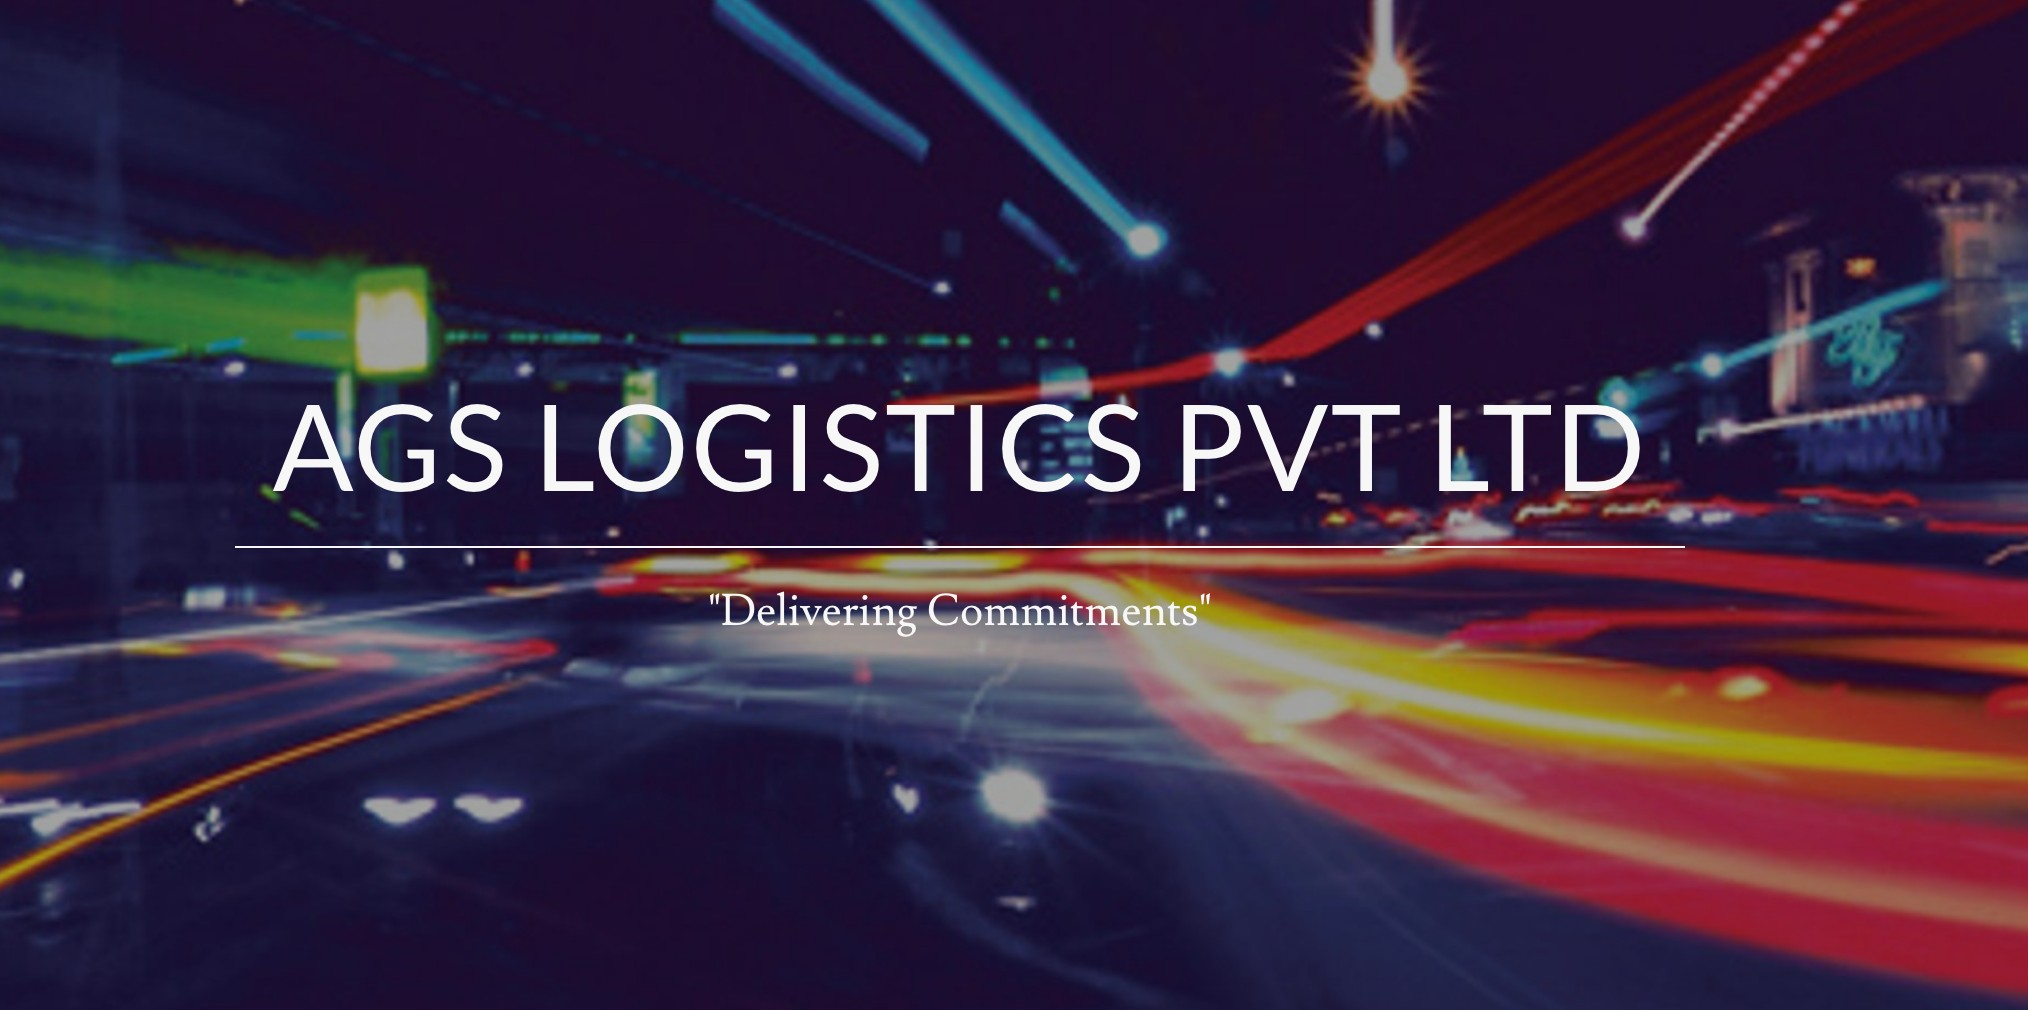 Ags Logistics Pvt Ltd ags logistics pvt ltd | linkedin